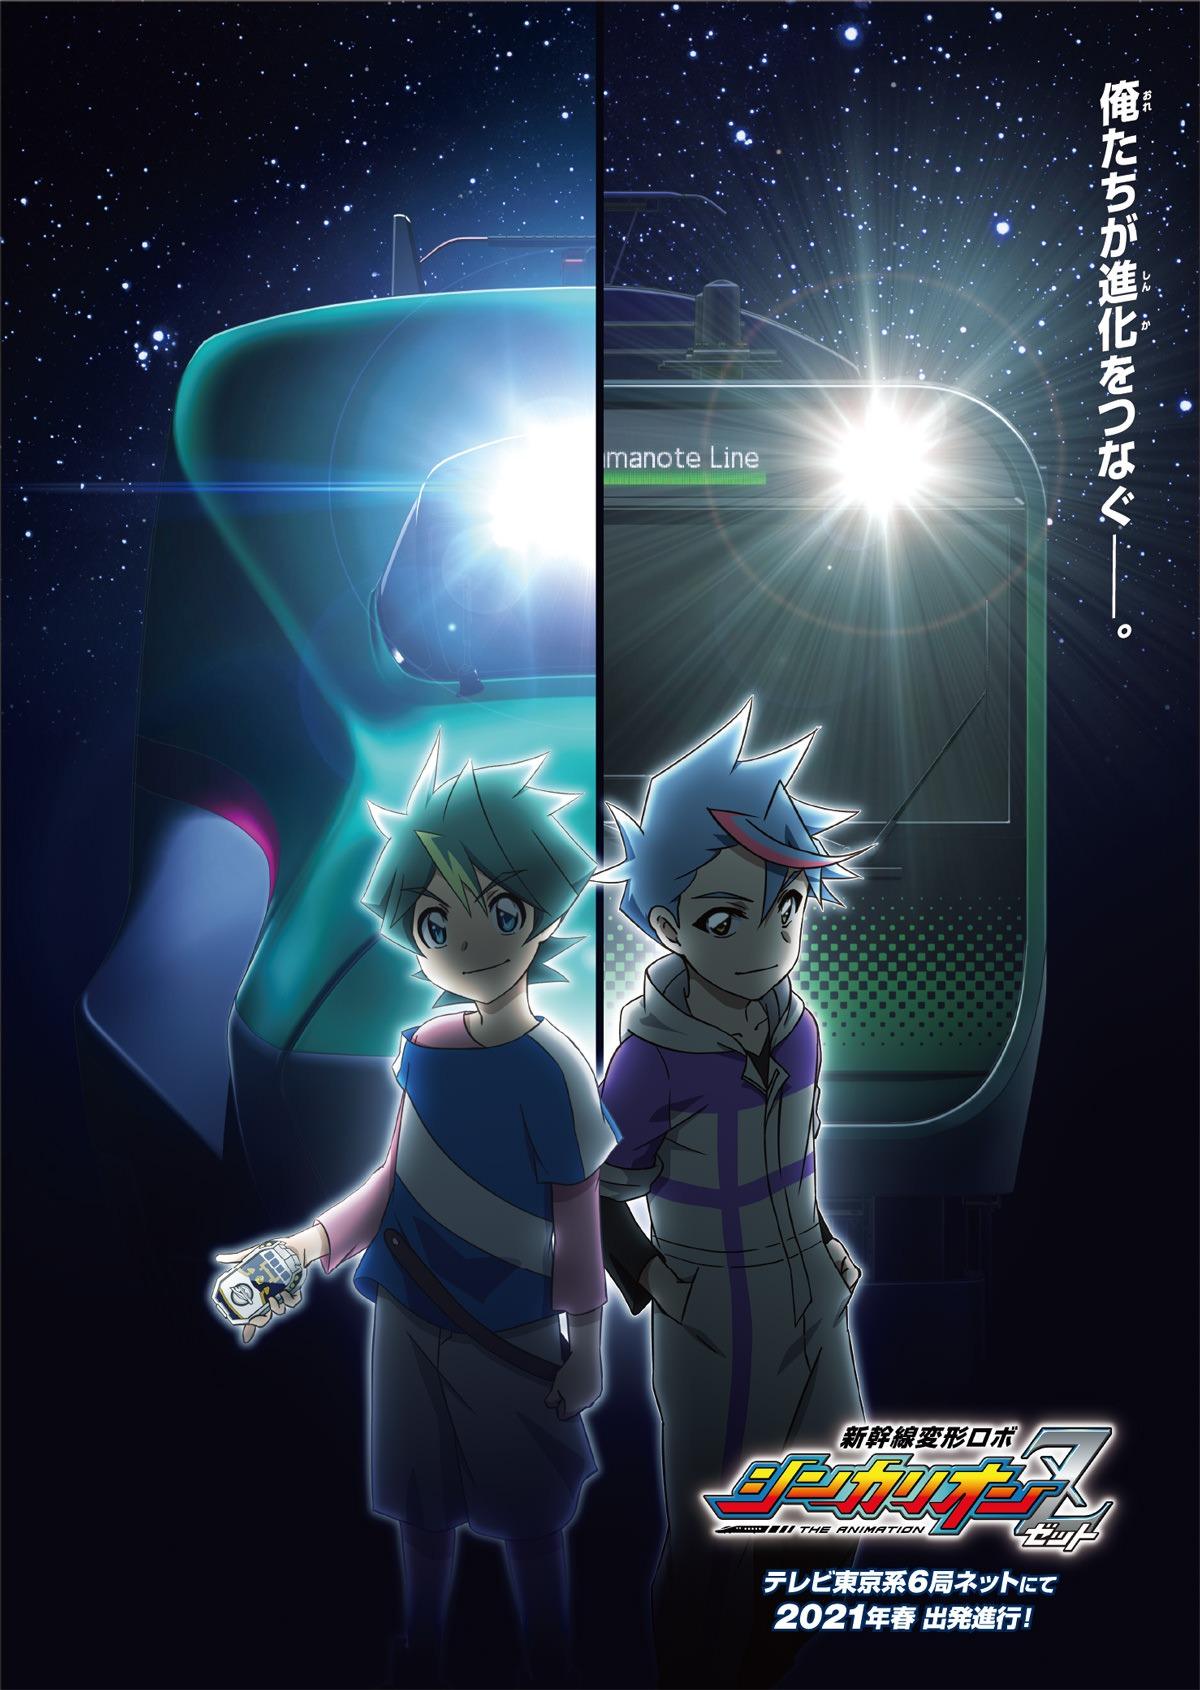 New Shinkalion anime announced - anime news - anime premieres - anime april 2021